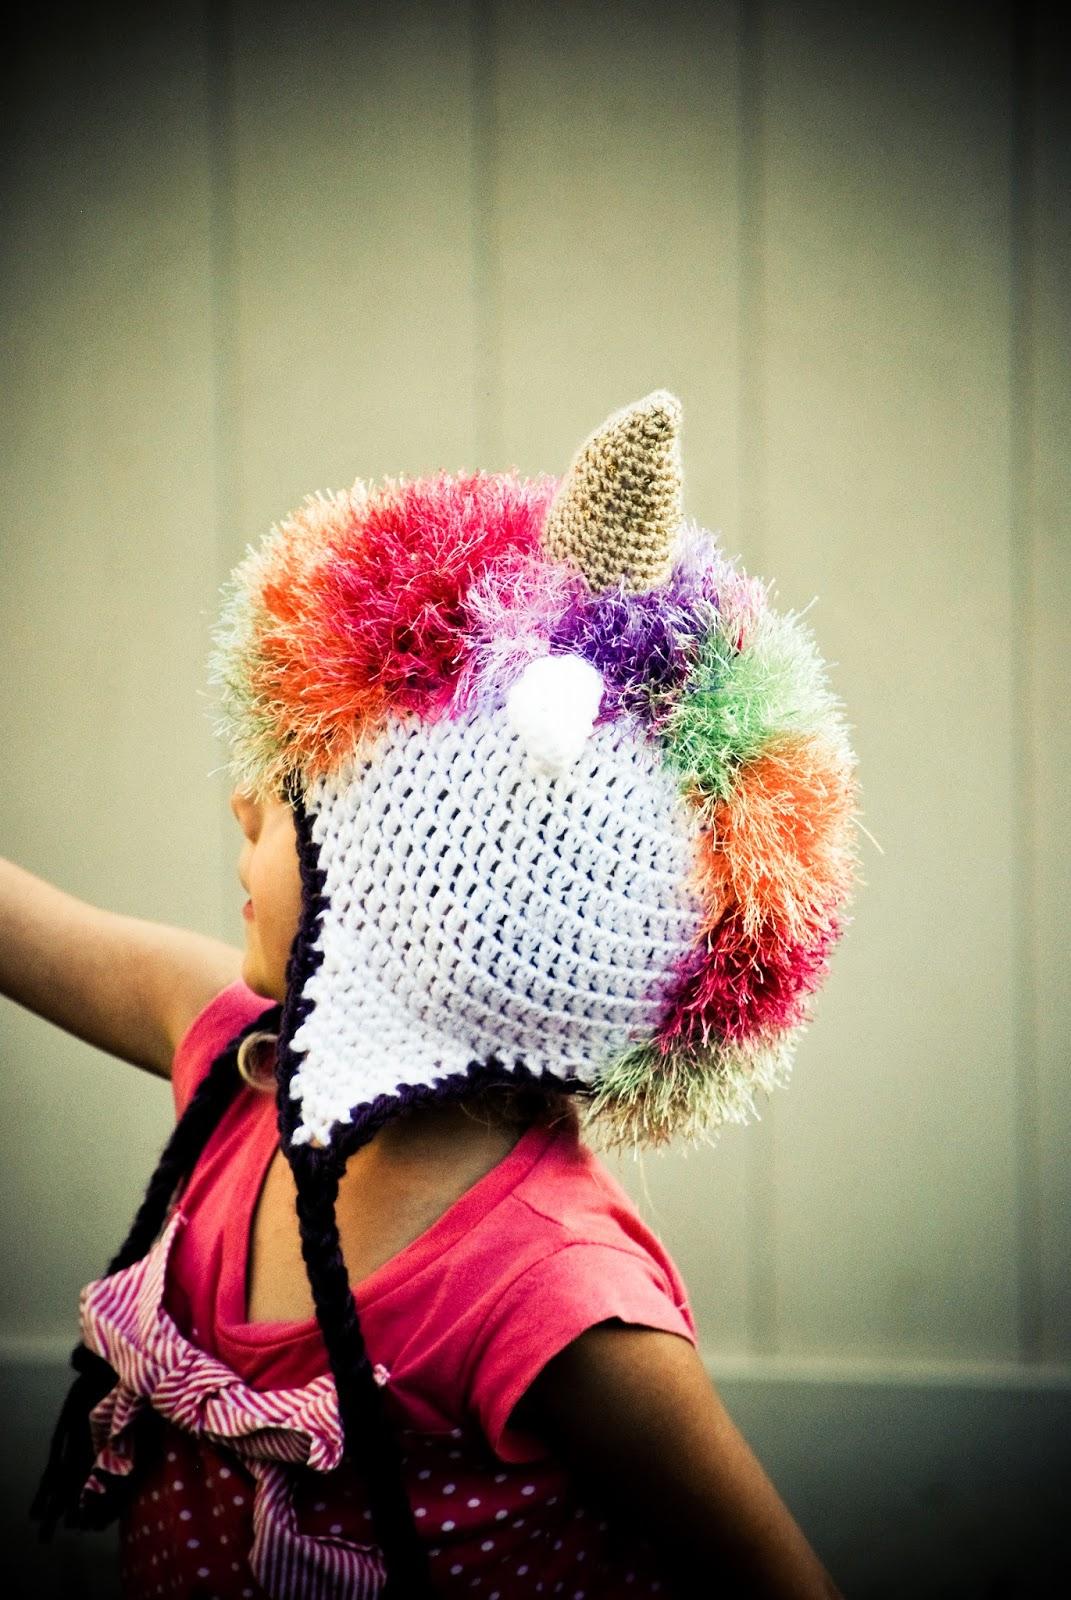 Crochet Pattern For Unicorn Hat : Mayas Wonderland: Crochet unicorn hat - Free crochet pattern